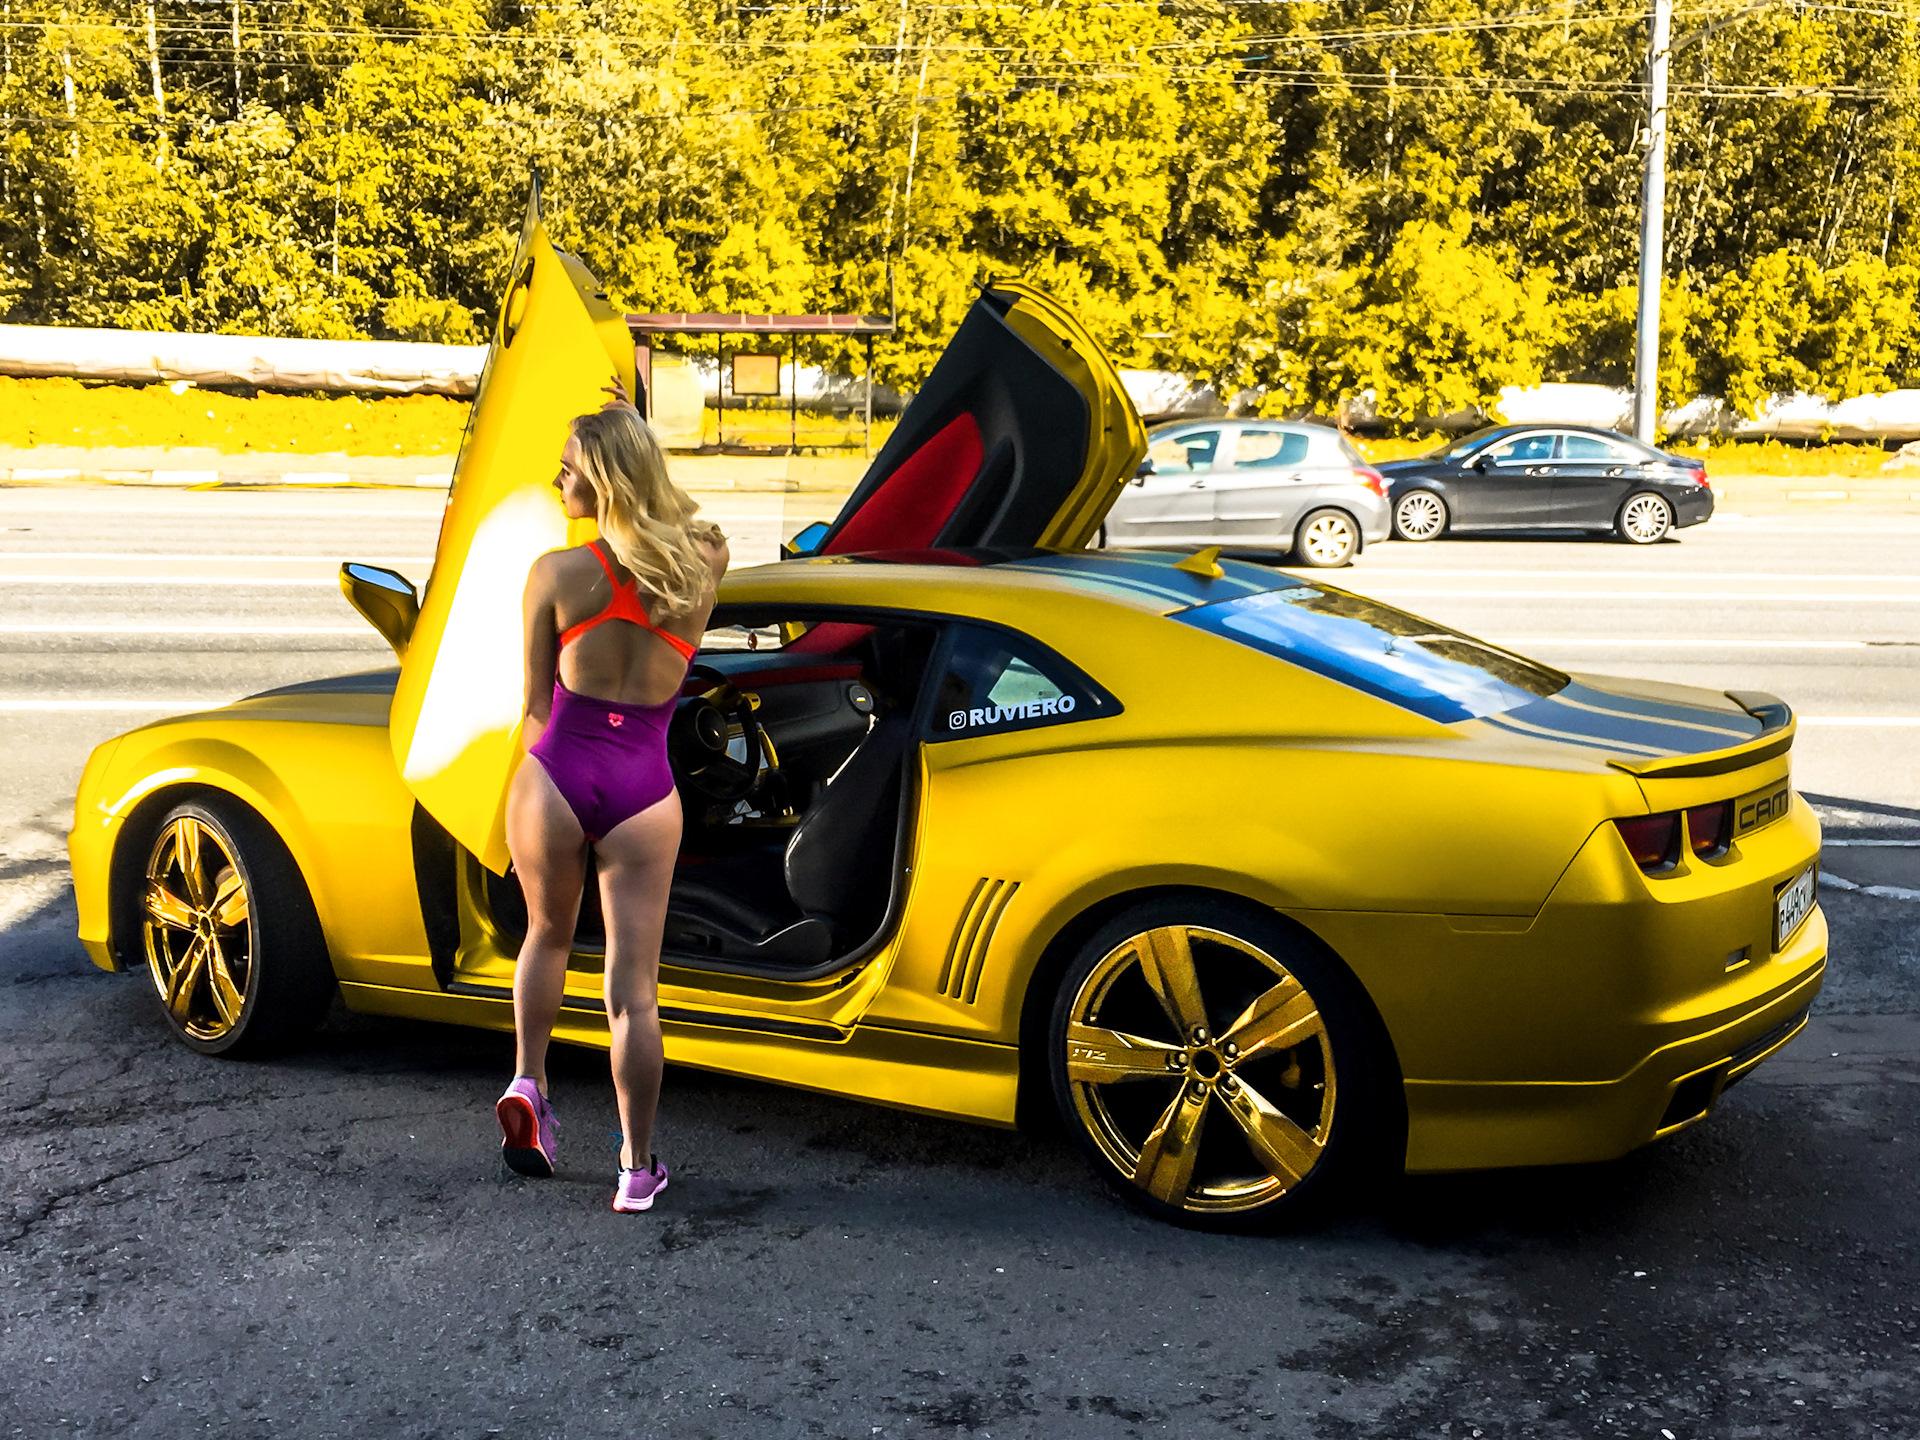 Sexy bitch on camaro, arab man paid for sex video